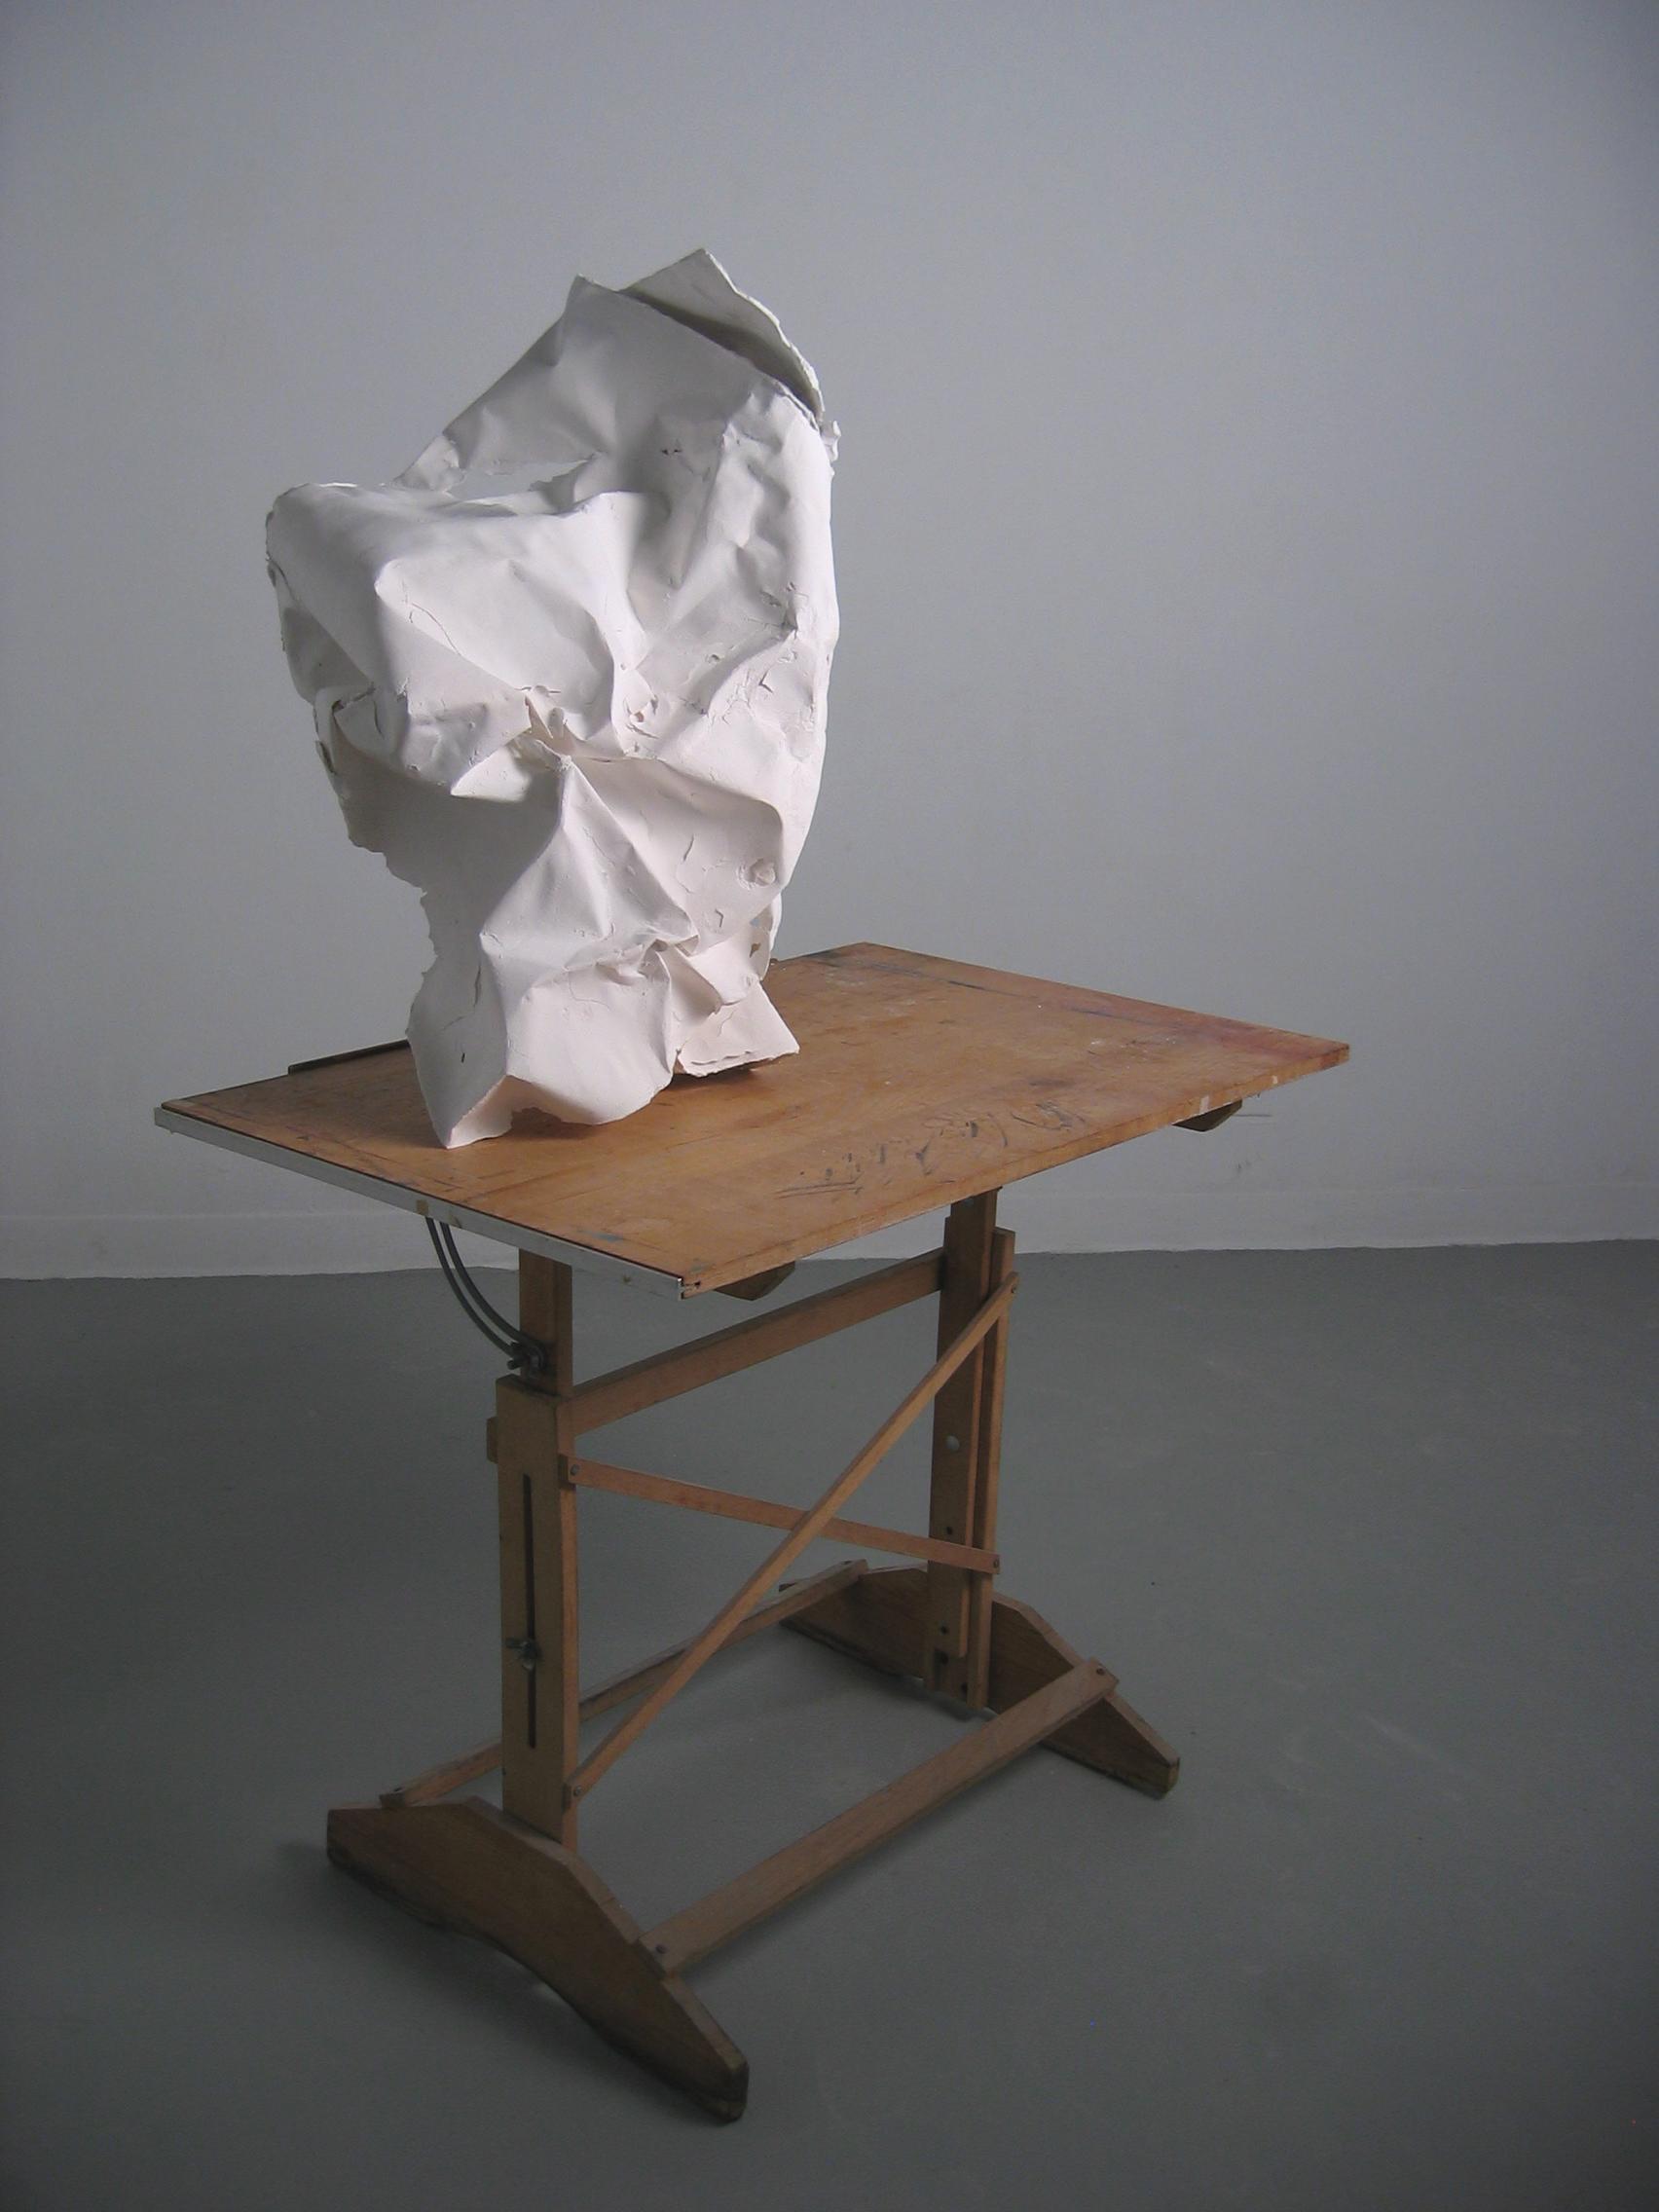 Cast porcelain, drafting table